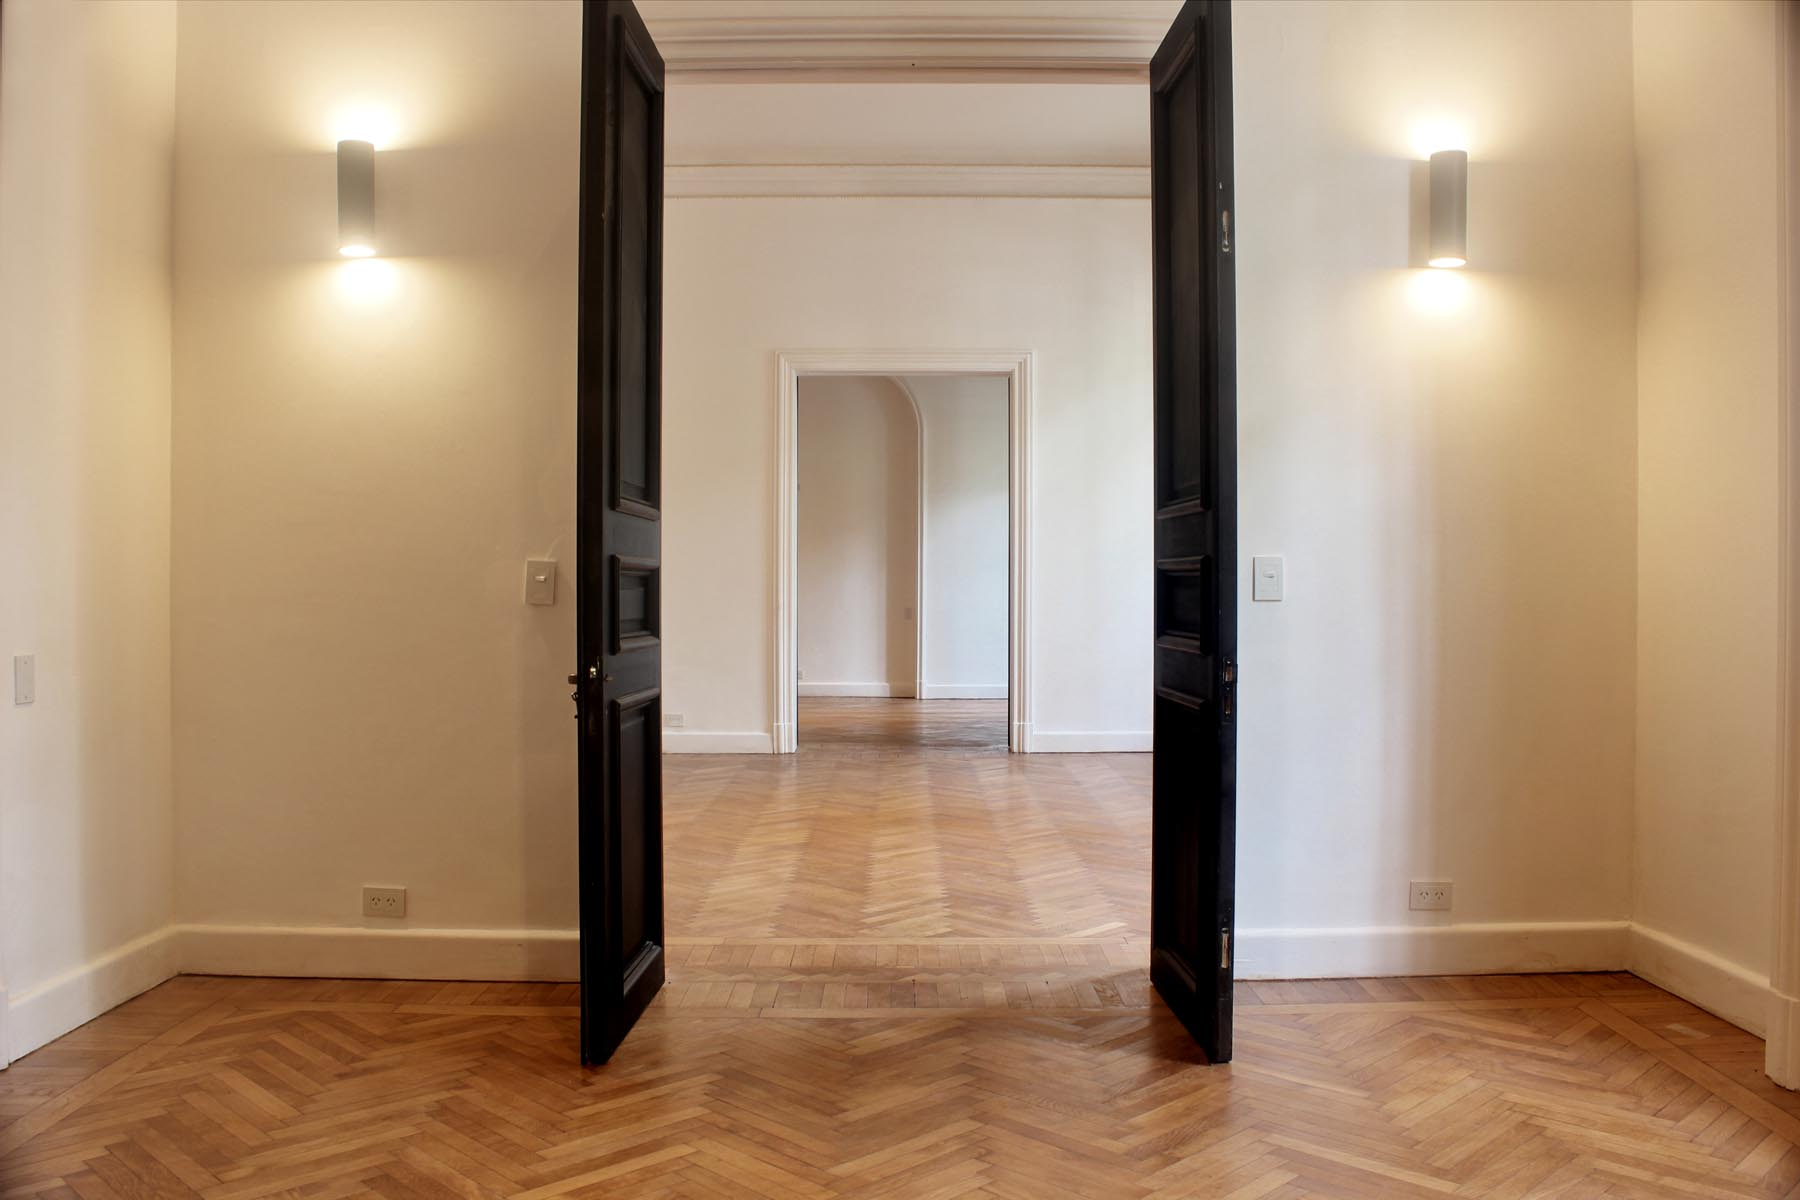 Apartments for Sale at Elegant ground floor Castex 3100 Buenos Aires, Buenos Aires 1425 Argentina